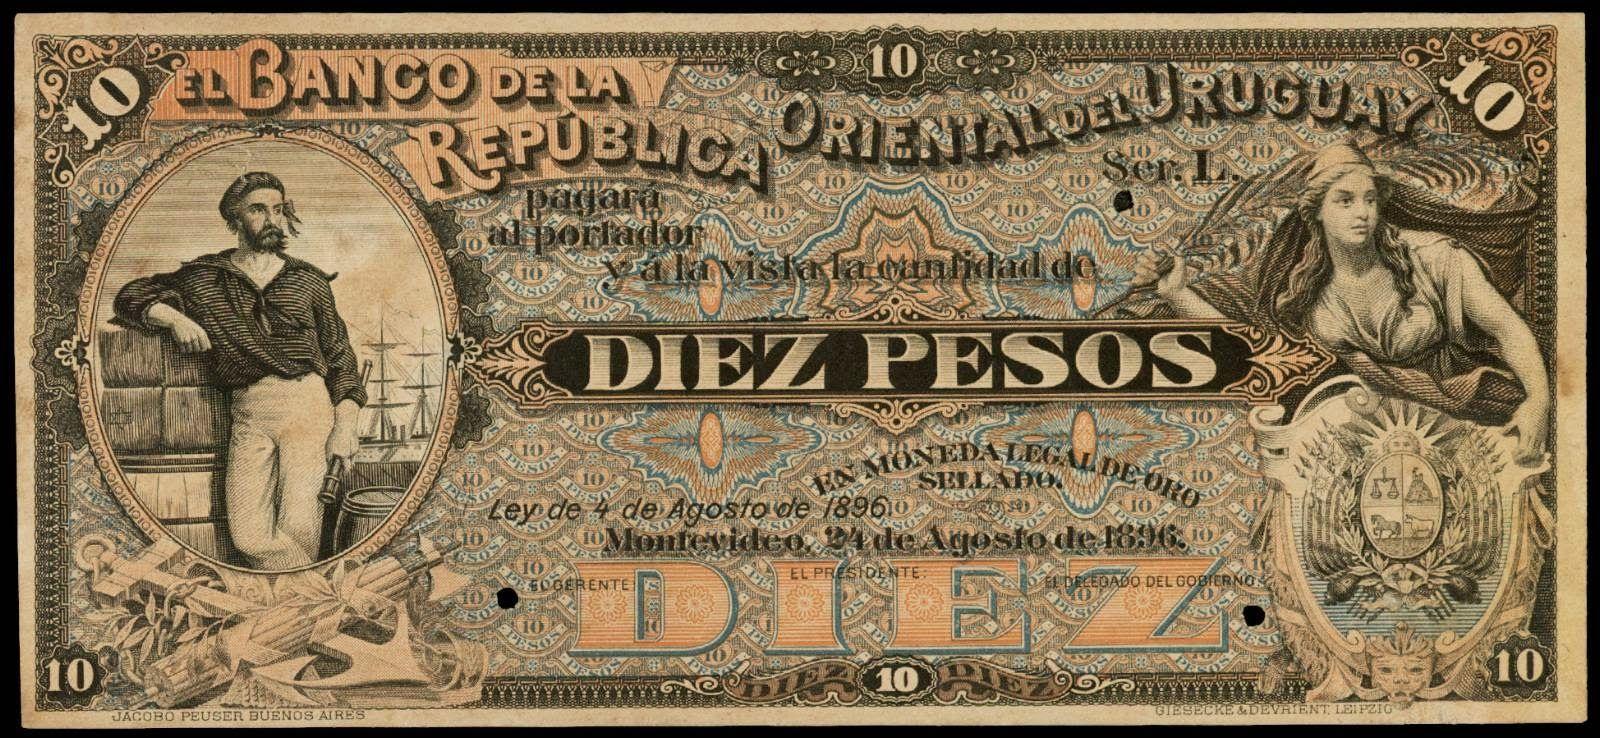 Http Www Worldbanknotescoins Com 2015 02 Uruguay 10 Pesos